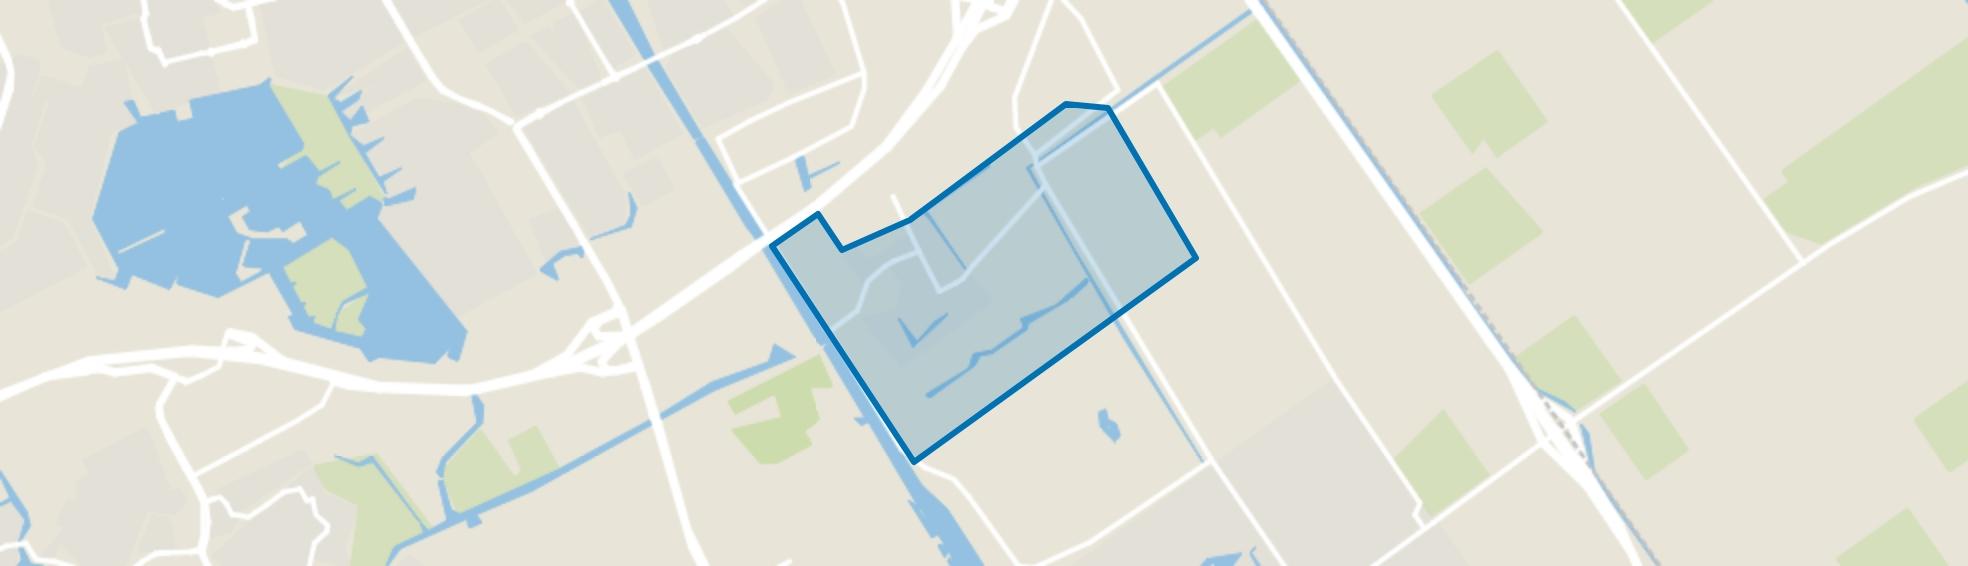 Nobelhorst, Almere map